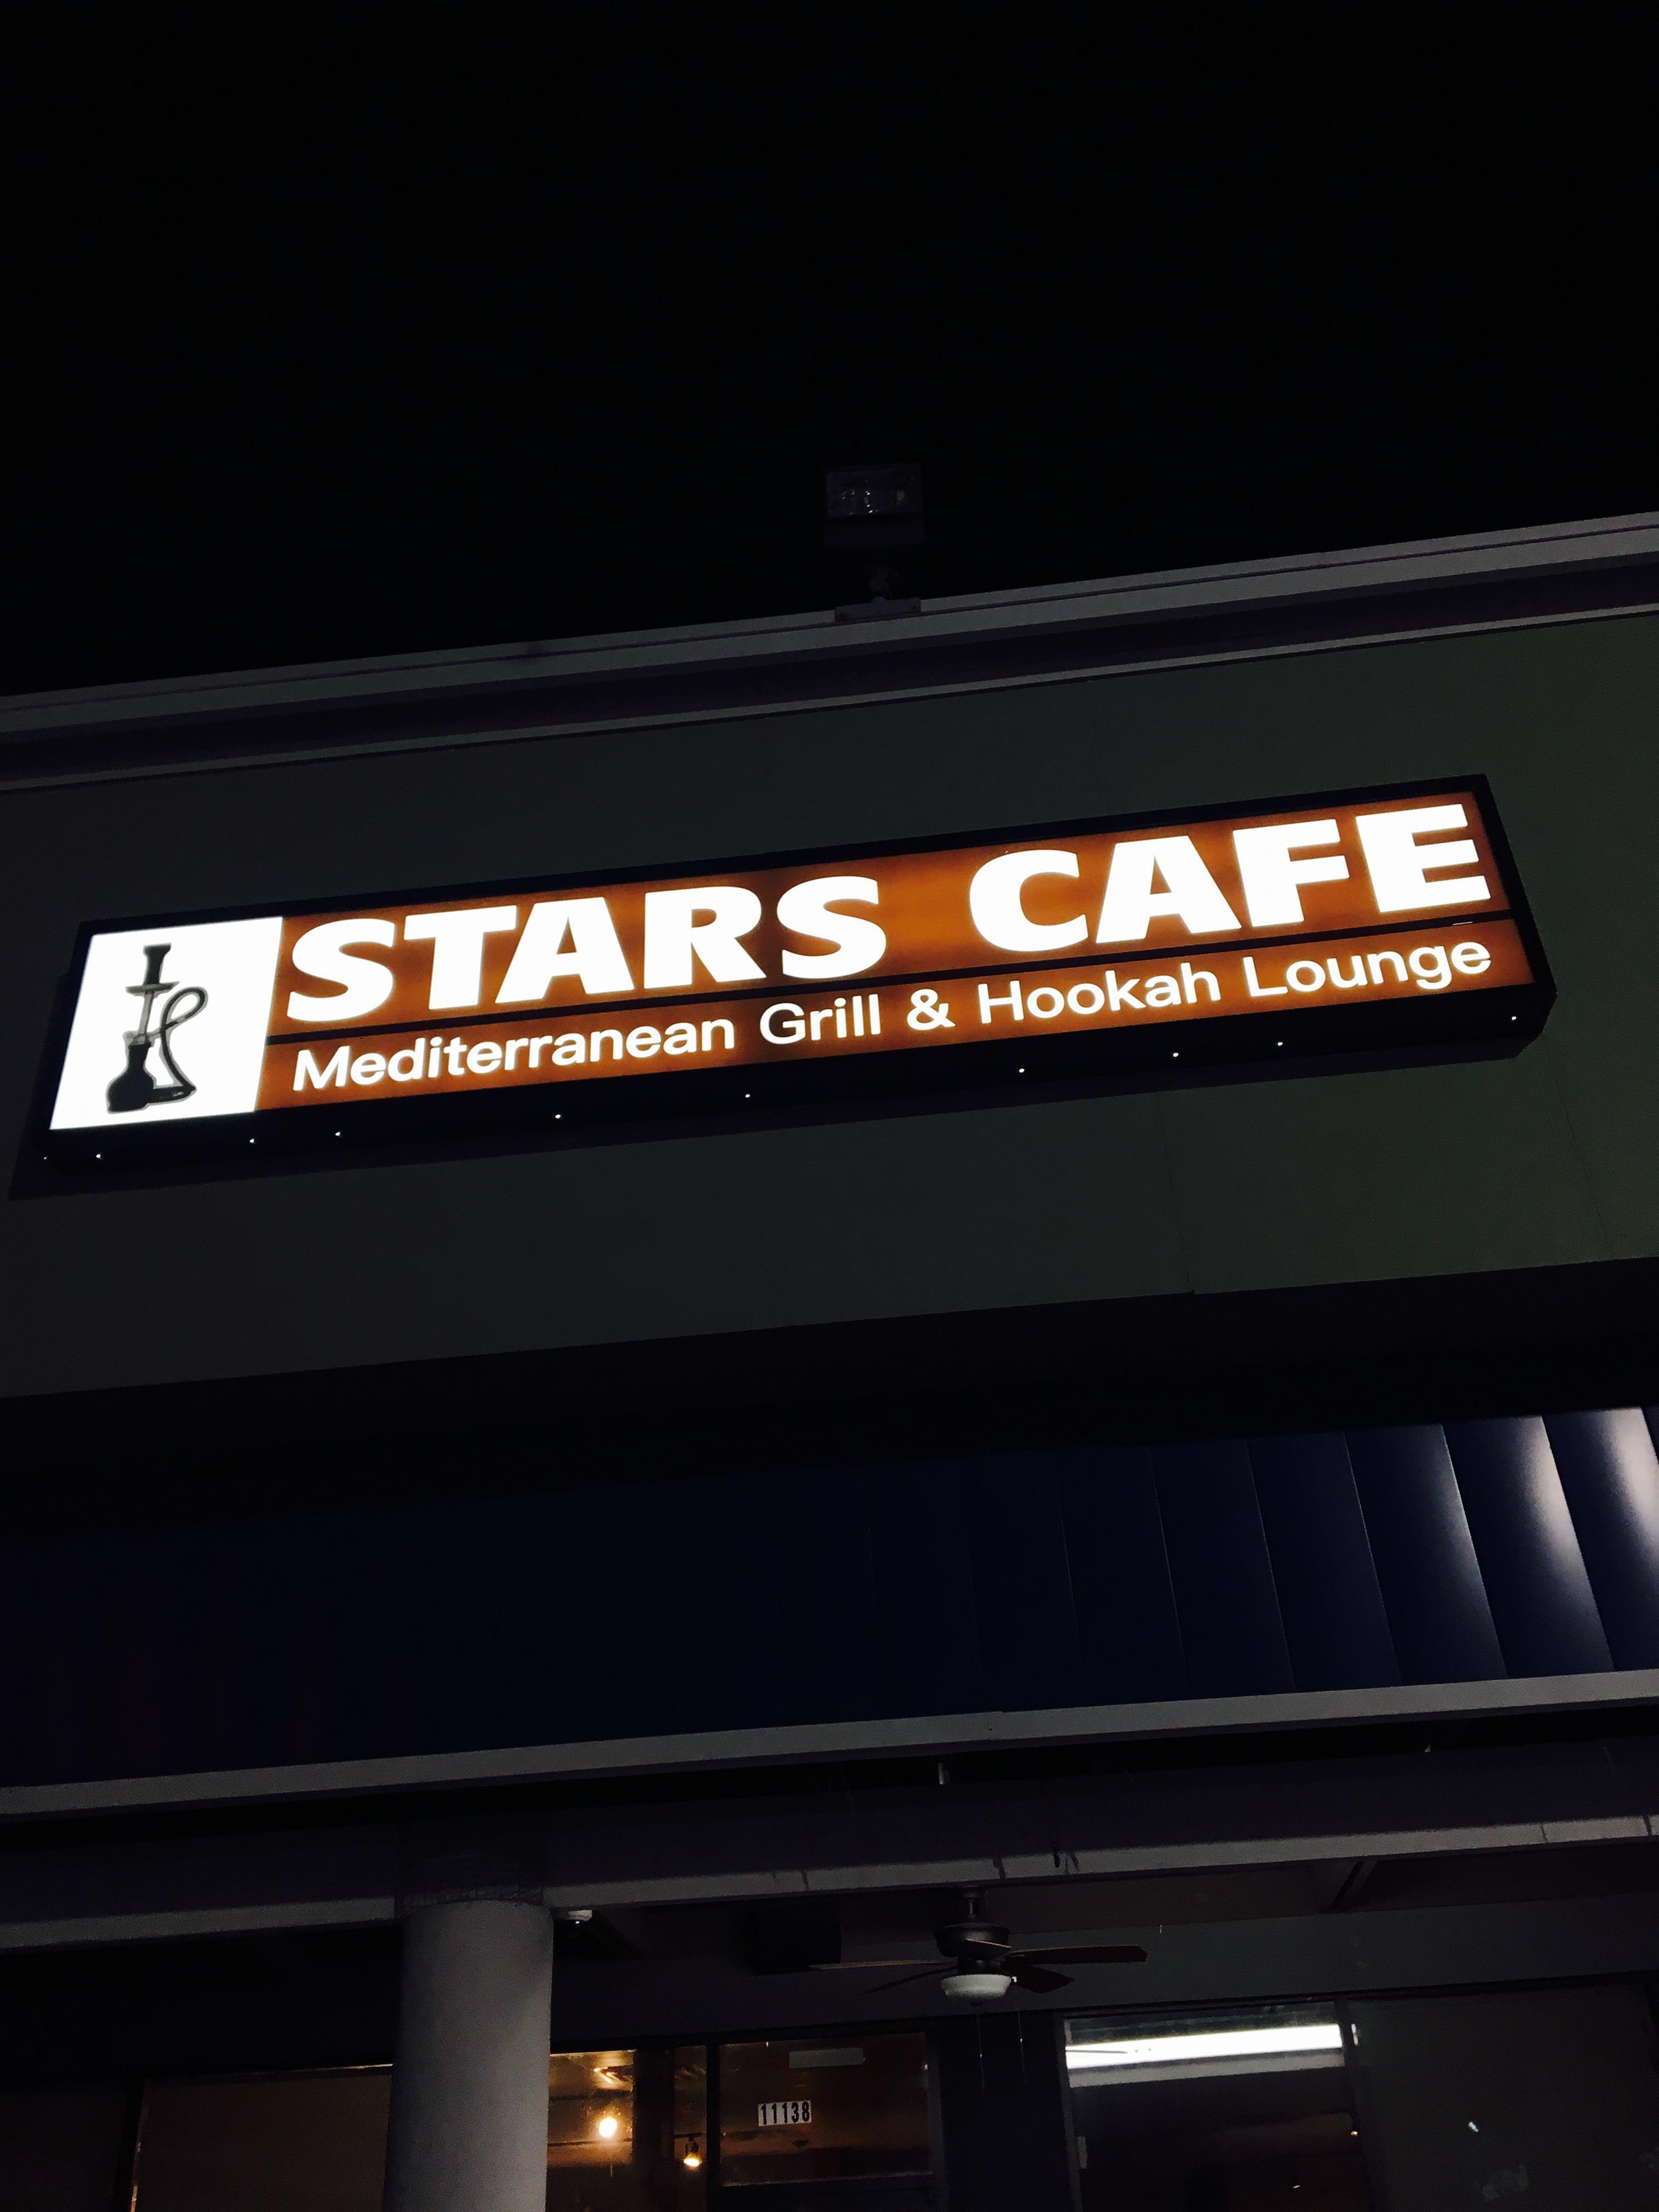 Hookah and Vibe   Houston, TX   Stars cafe   September 13, 2017